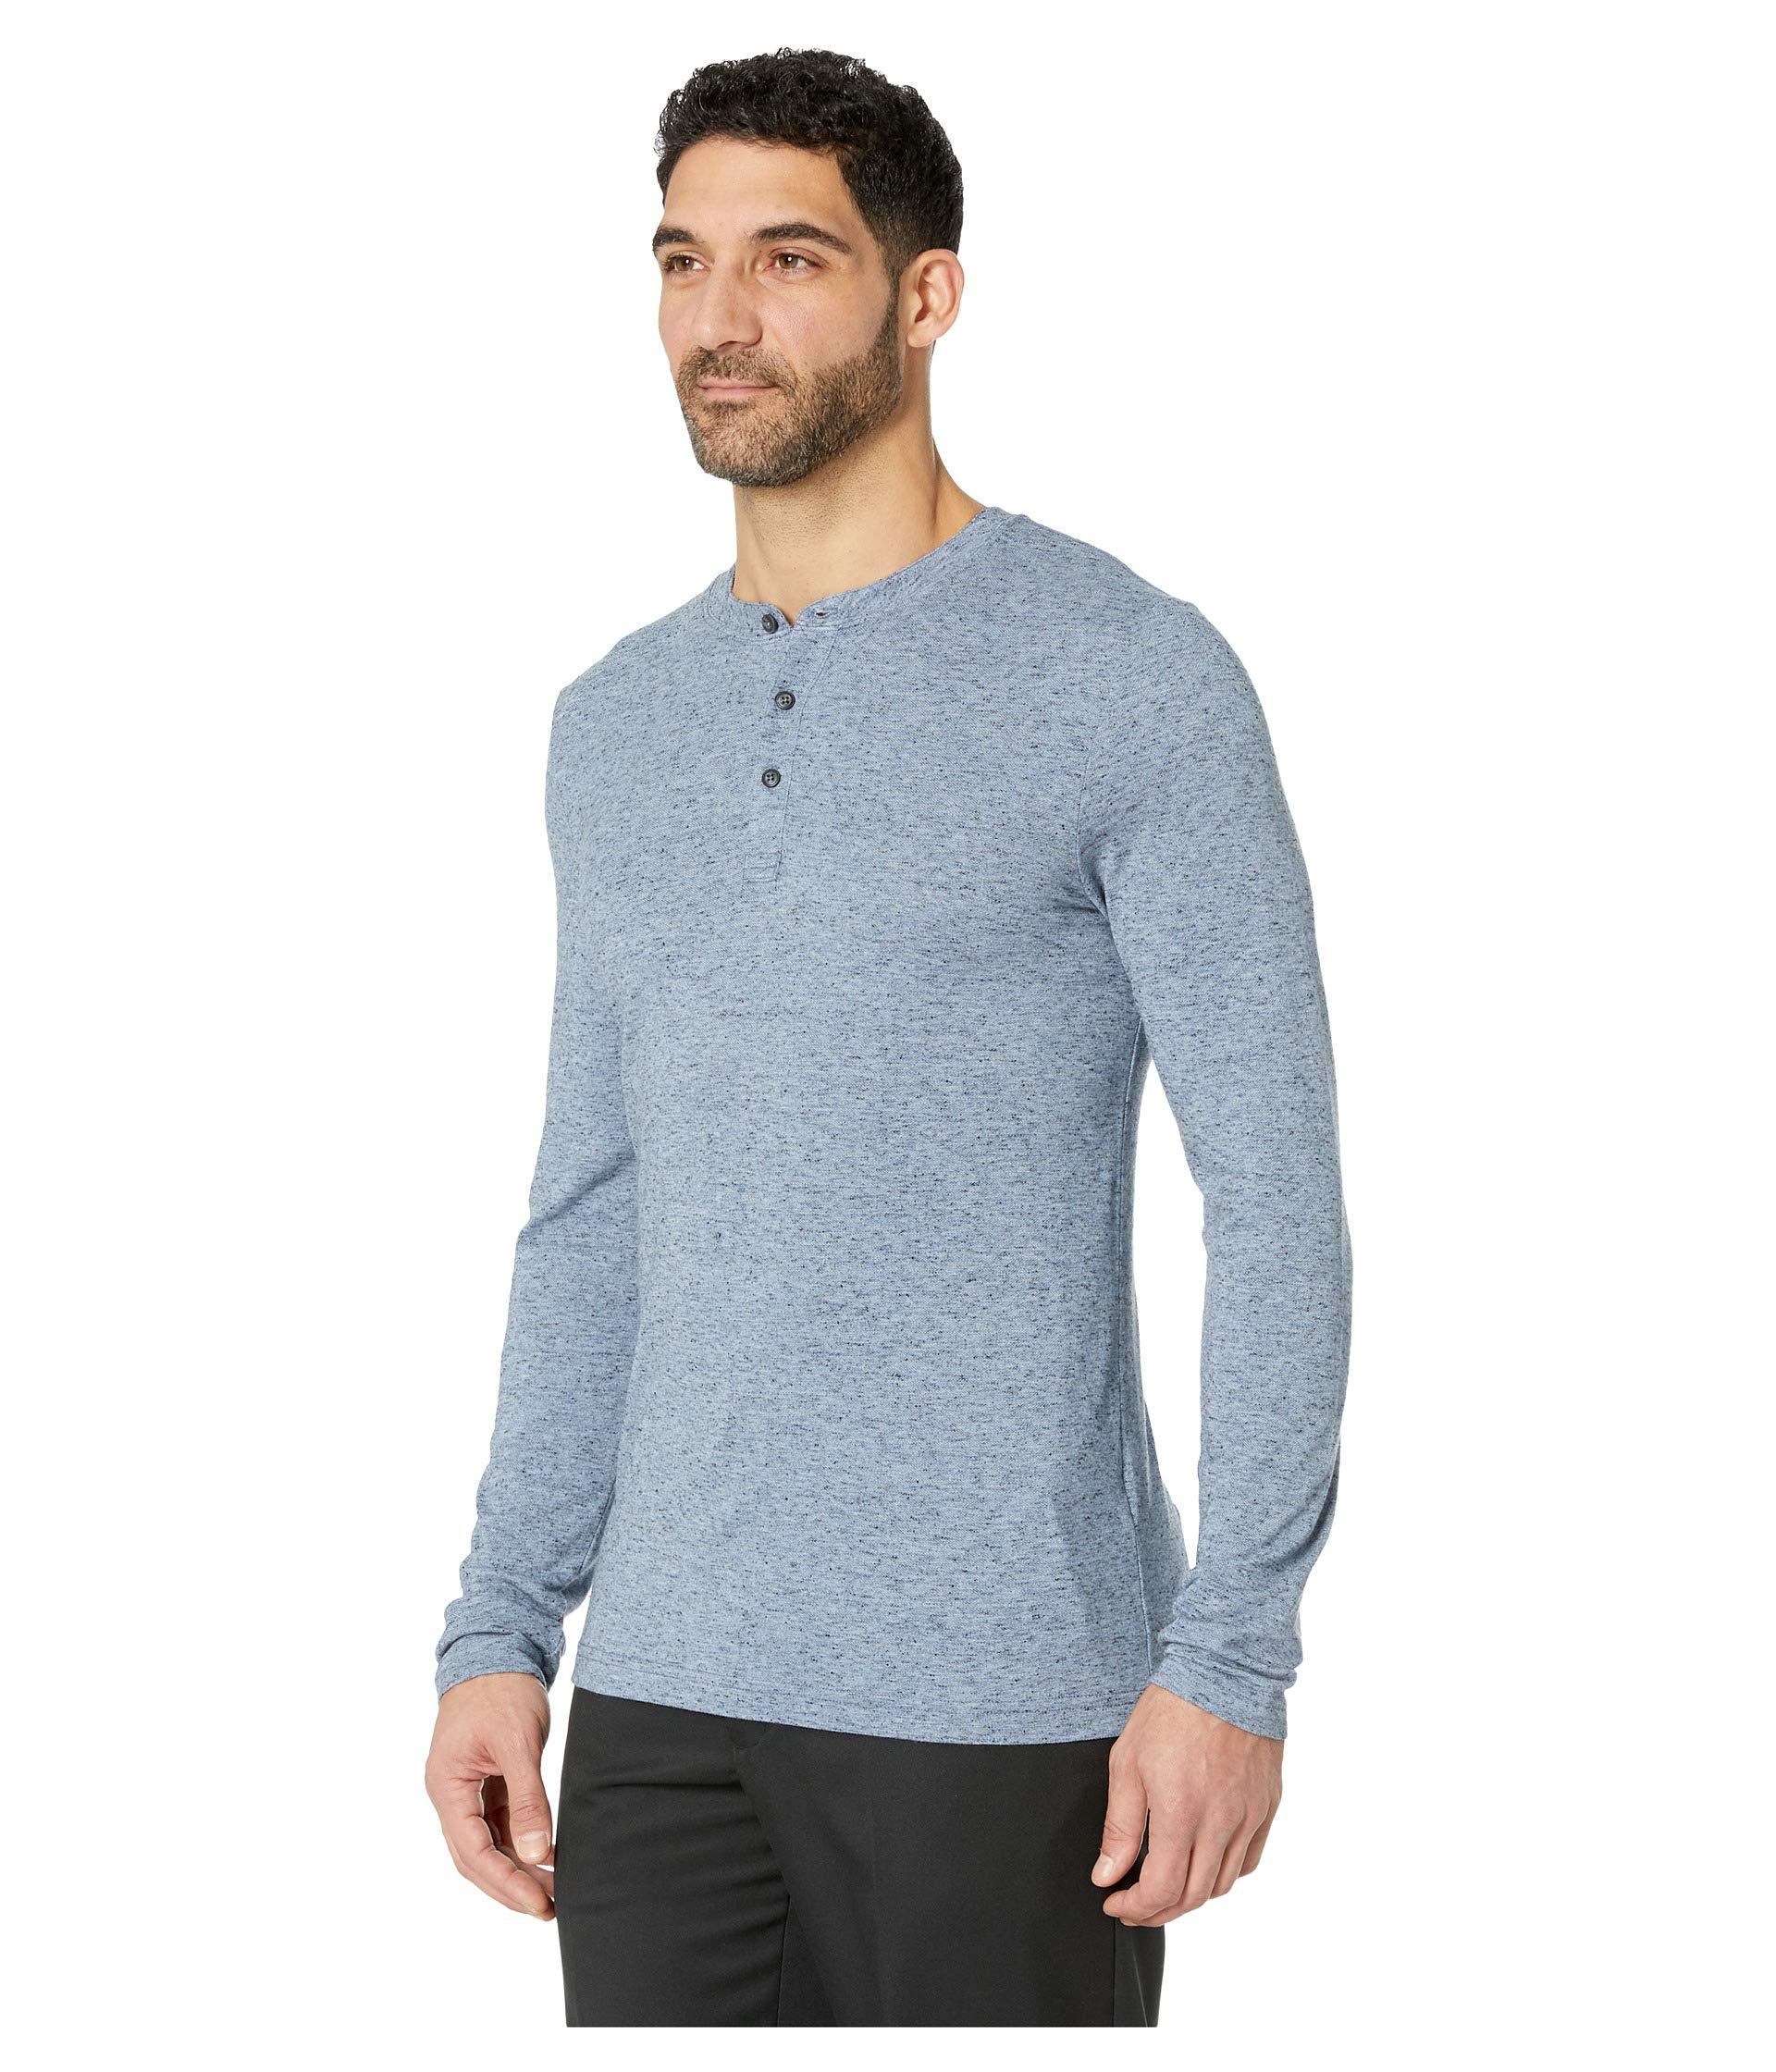 b7f4cac1 Lyst - Travis Mathew Kazakos (heather Blue Nights) Men's Long Sleeve  Pullover in Blue for Men